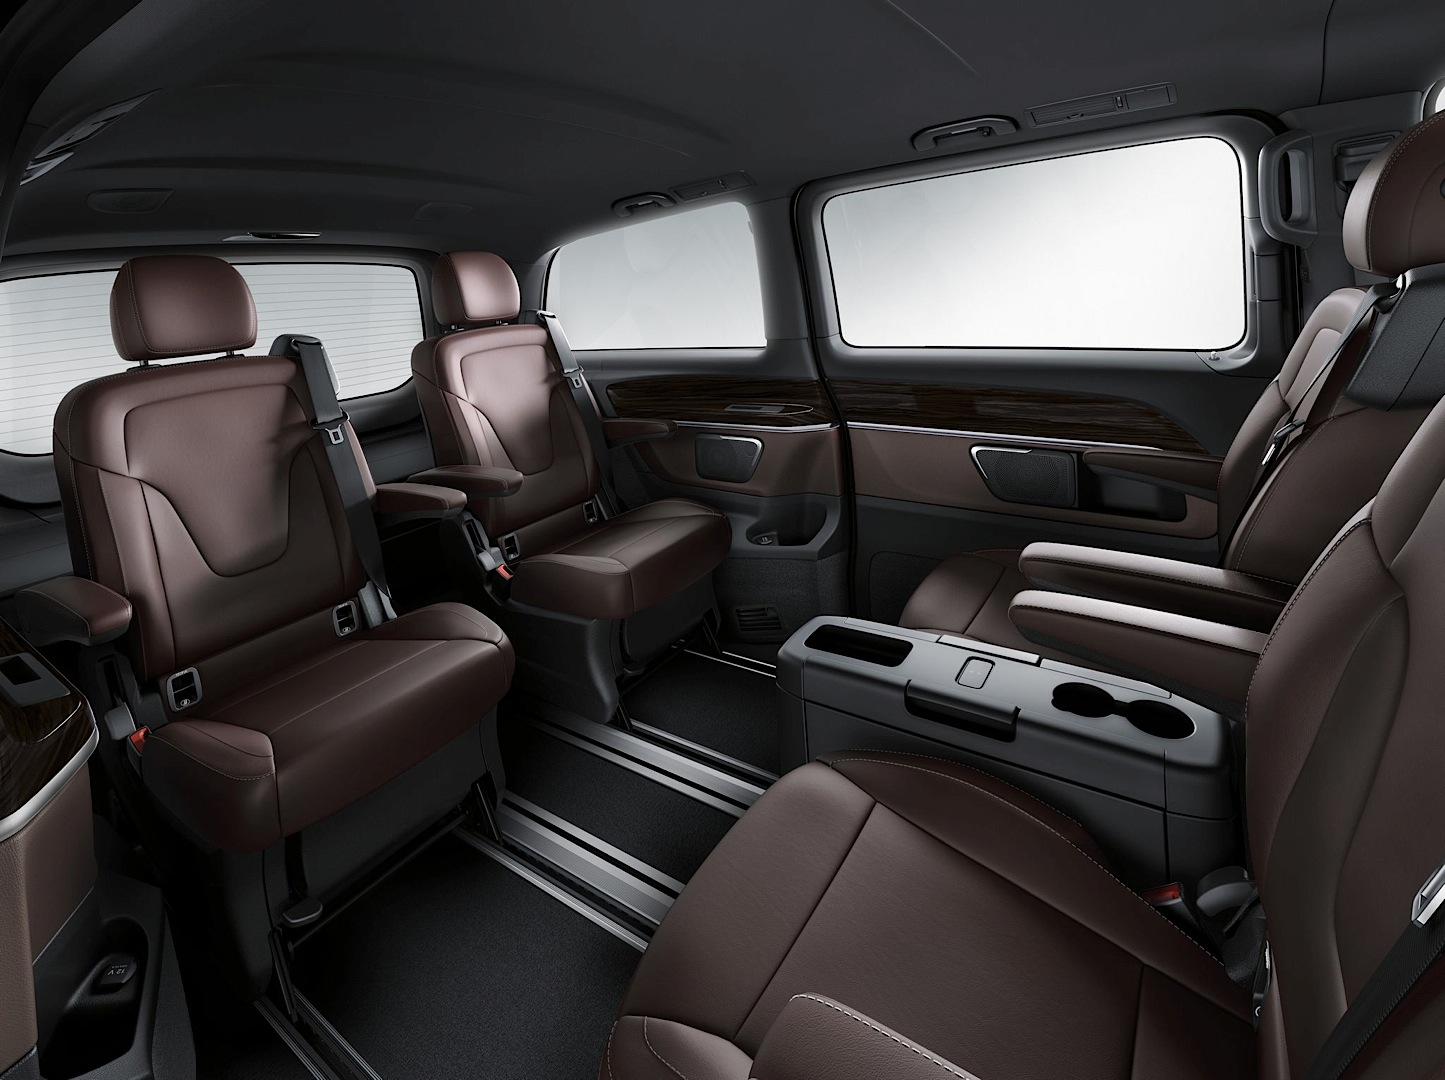 2015 MercedesBenz VClass Edition 1 Gets Detailed Photo Gallery  autoevolution